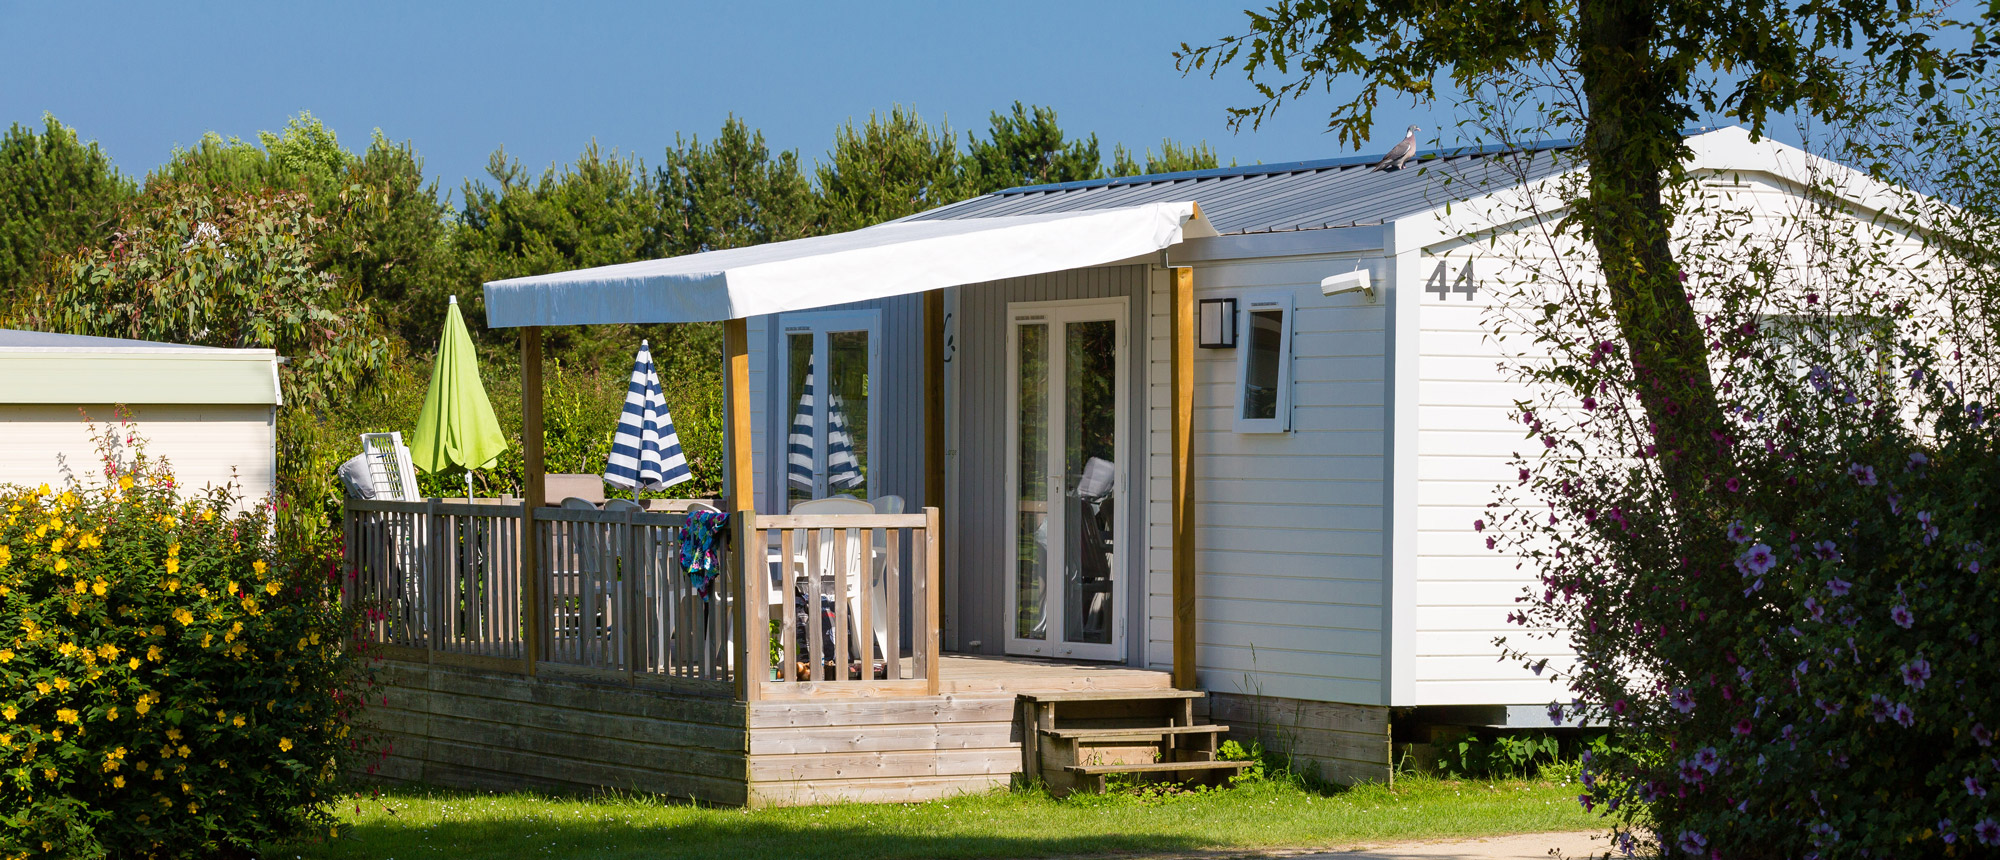 mobile-home camping Ar Kleguer